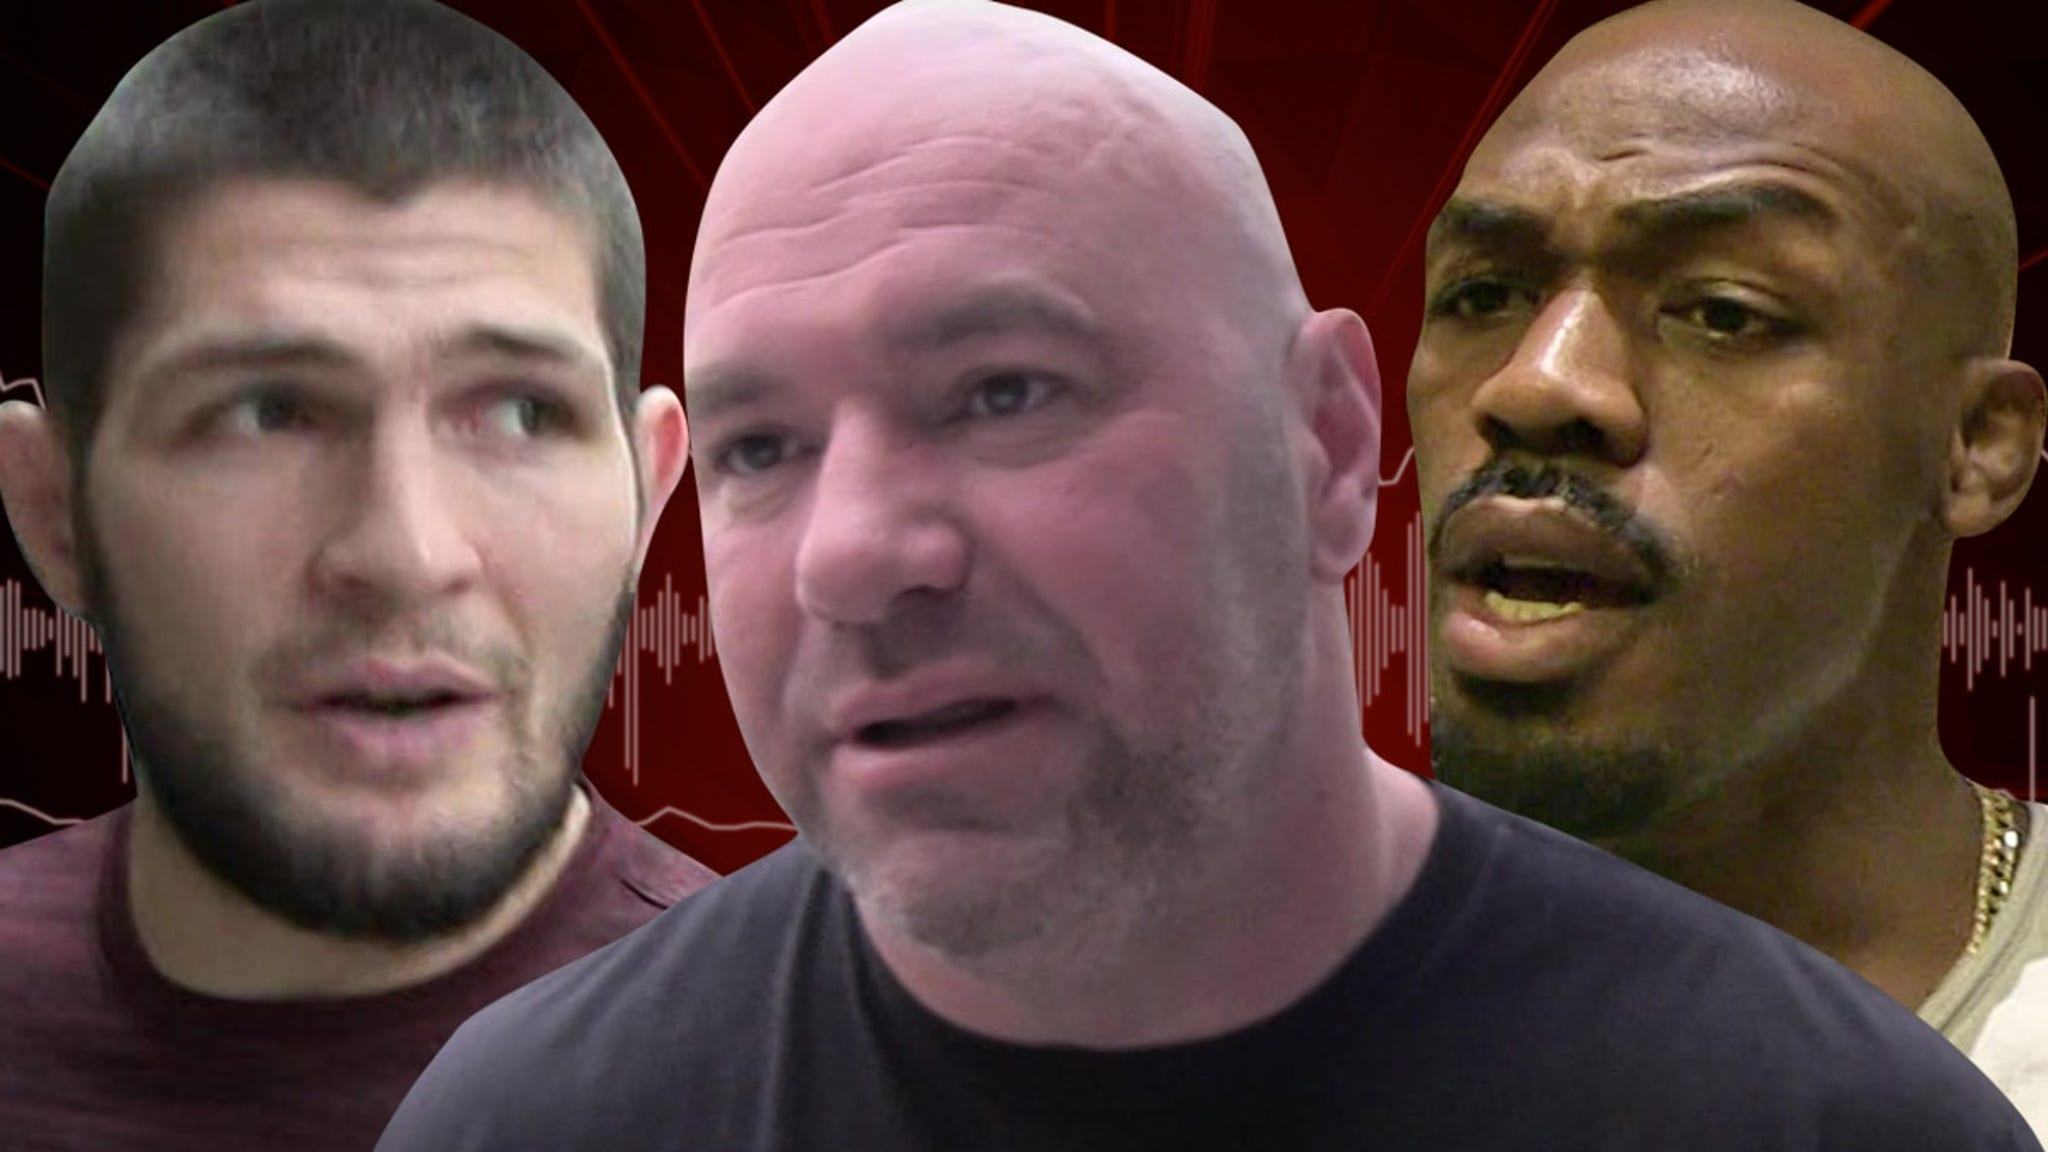 Dana White Betting on Khabib Fighting Again, Names 4 Possible Opponents